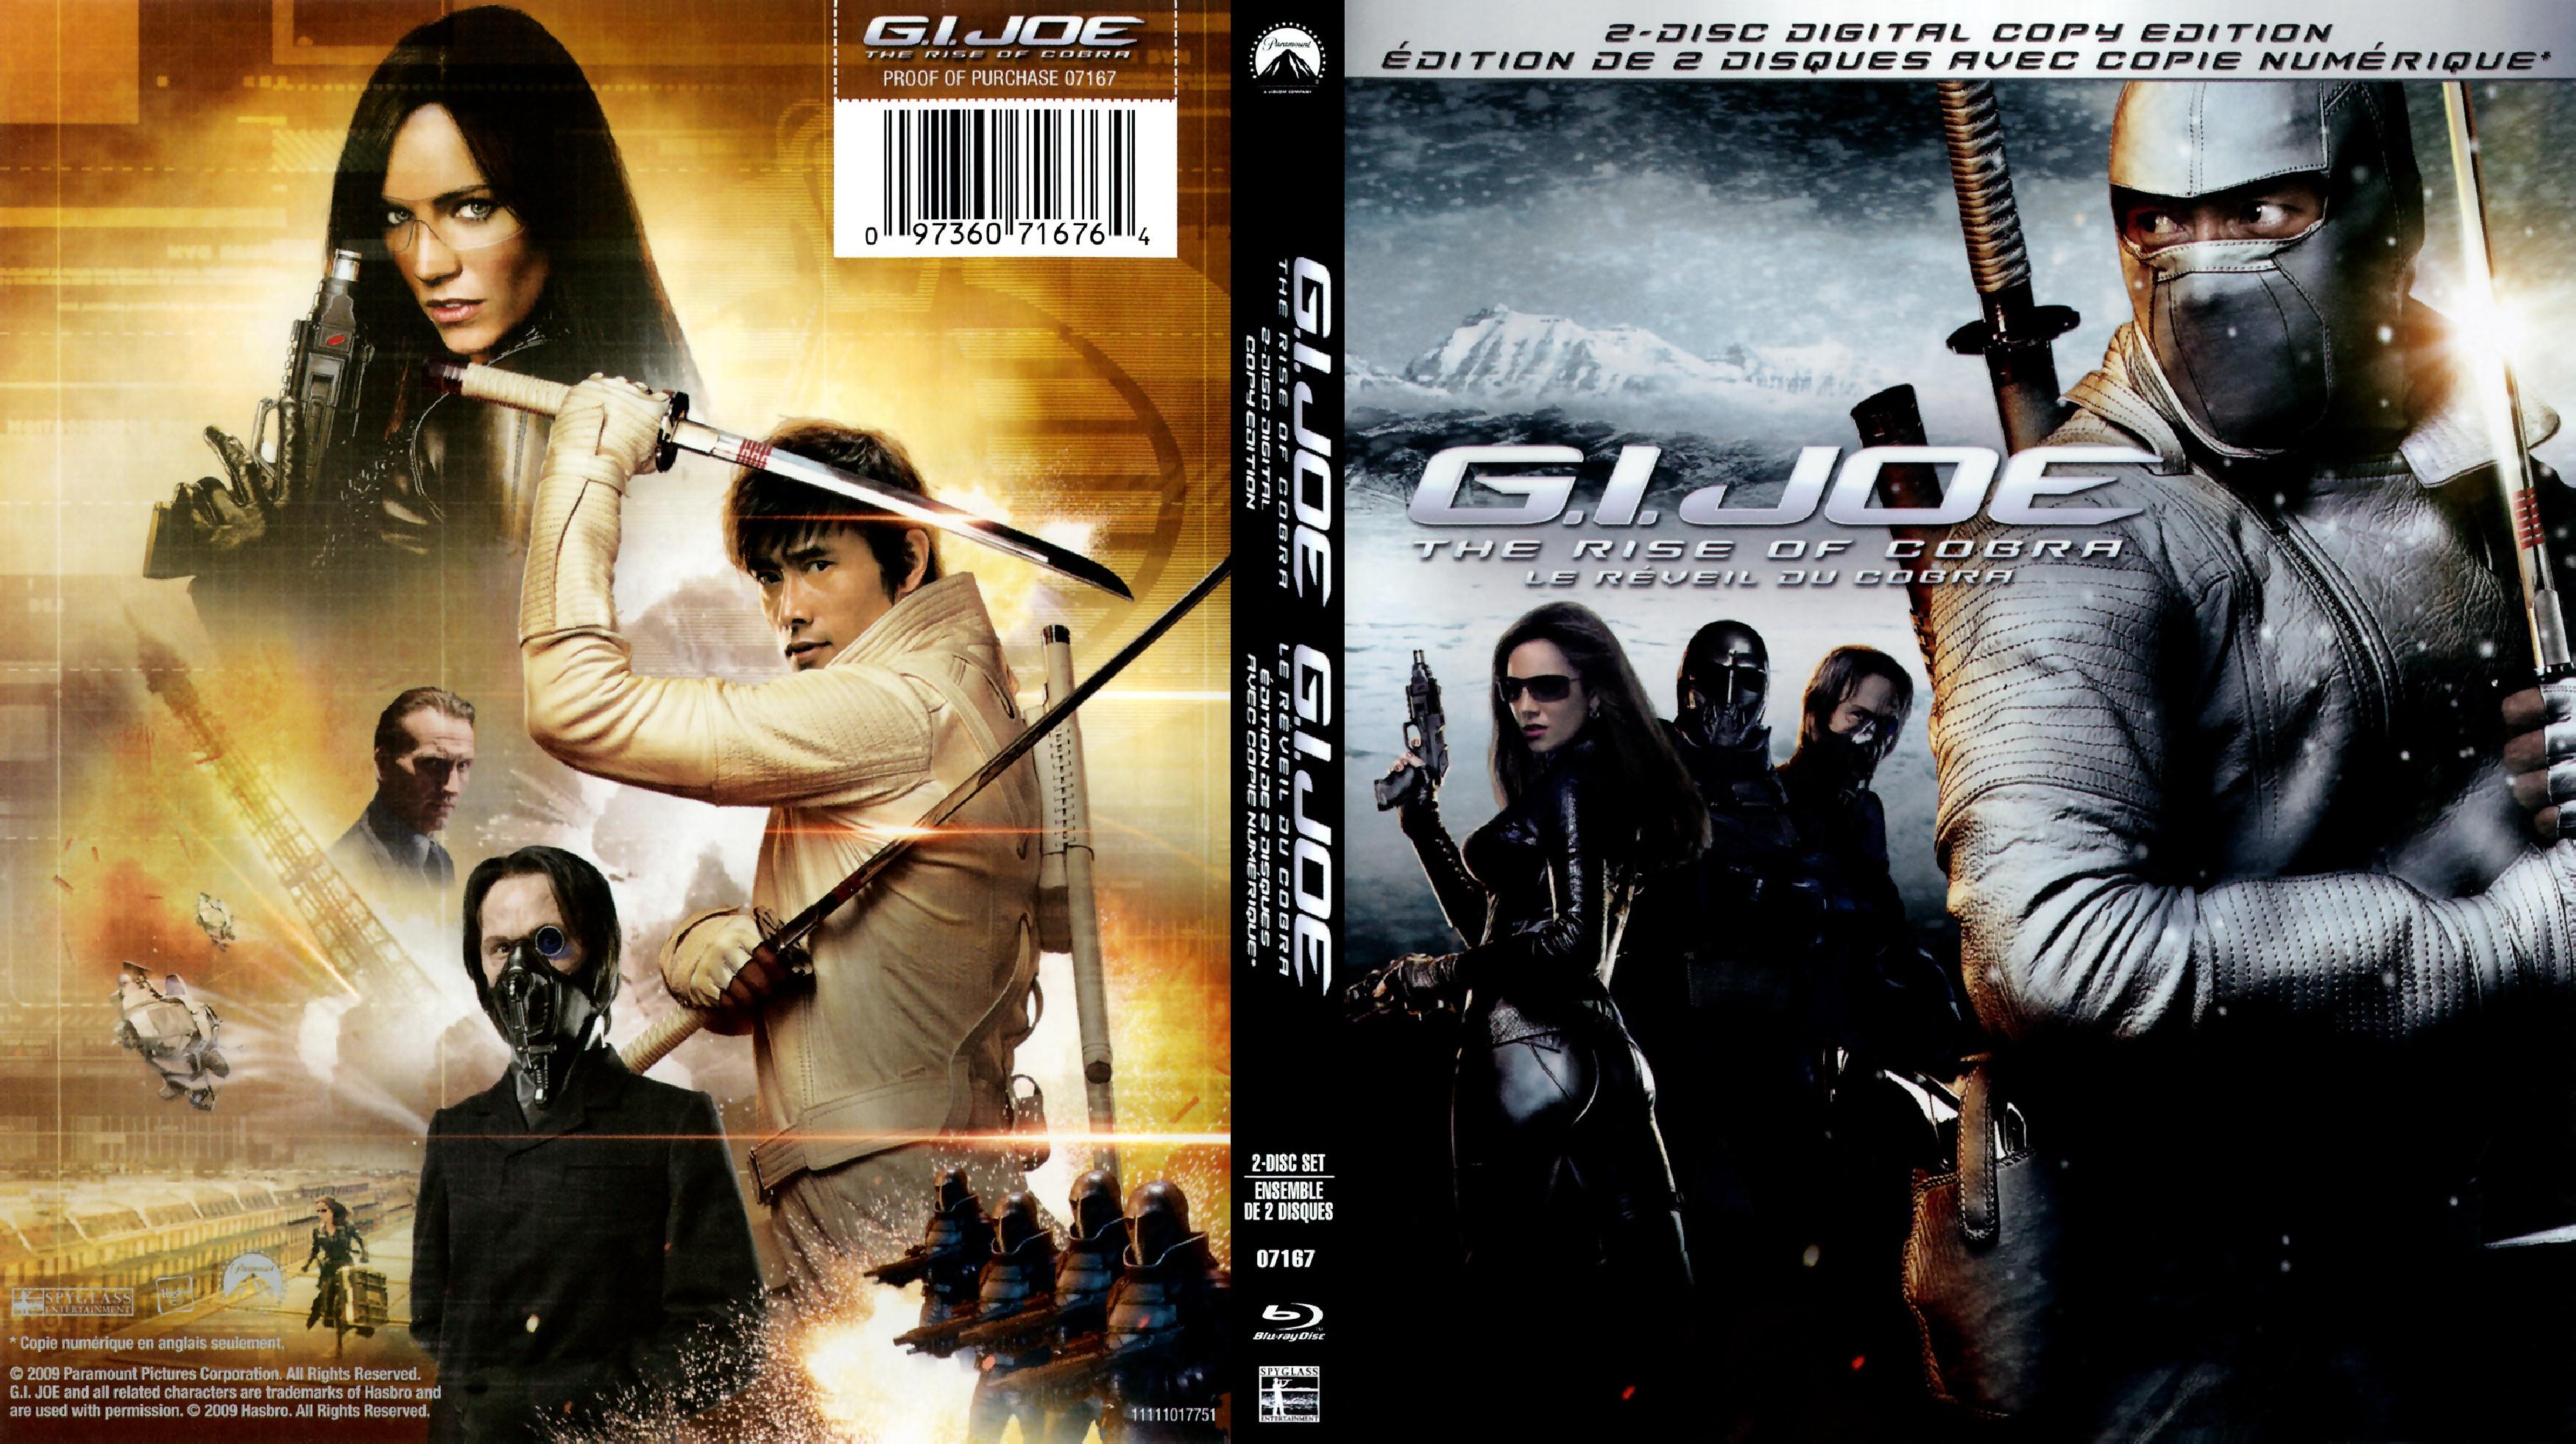 Covers Box Sk G I Joe The Rise Of Cobra 2009 Imdb Dl High Quality Dvd Blueray Movie